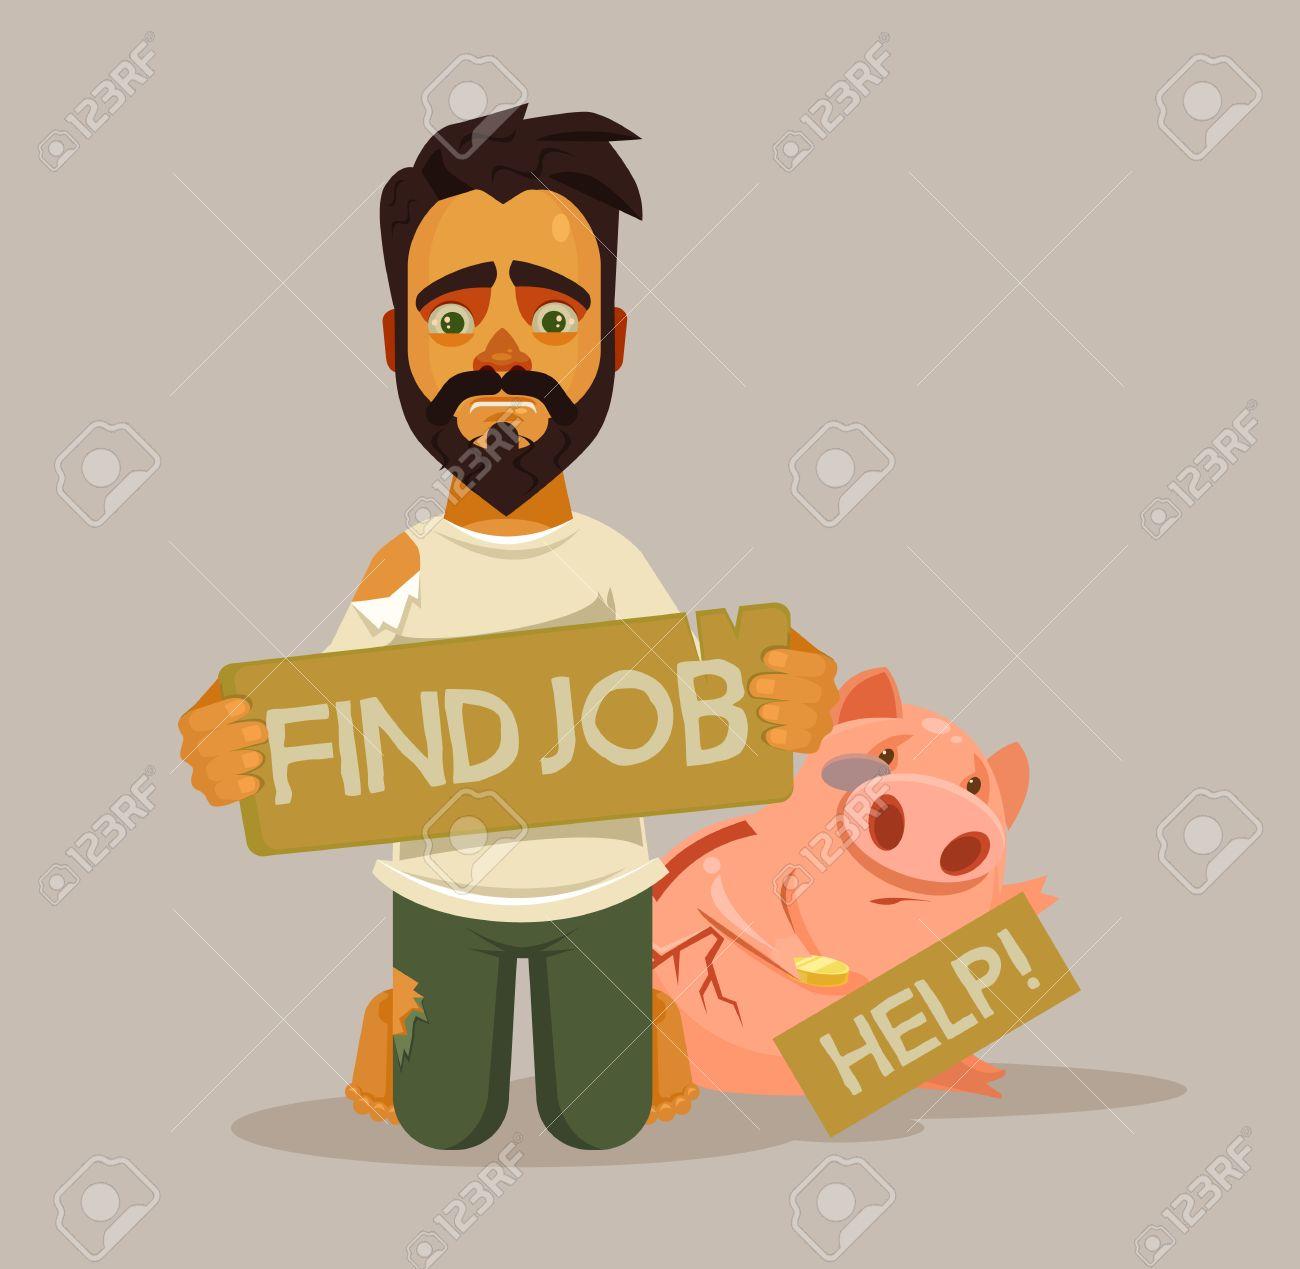 Unemployed homeless man character need job vector flat cartoon